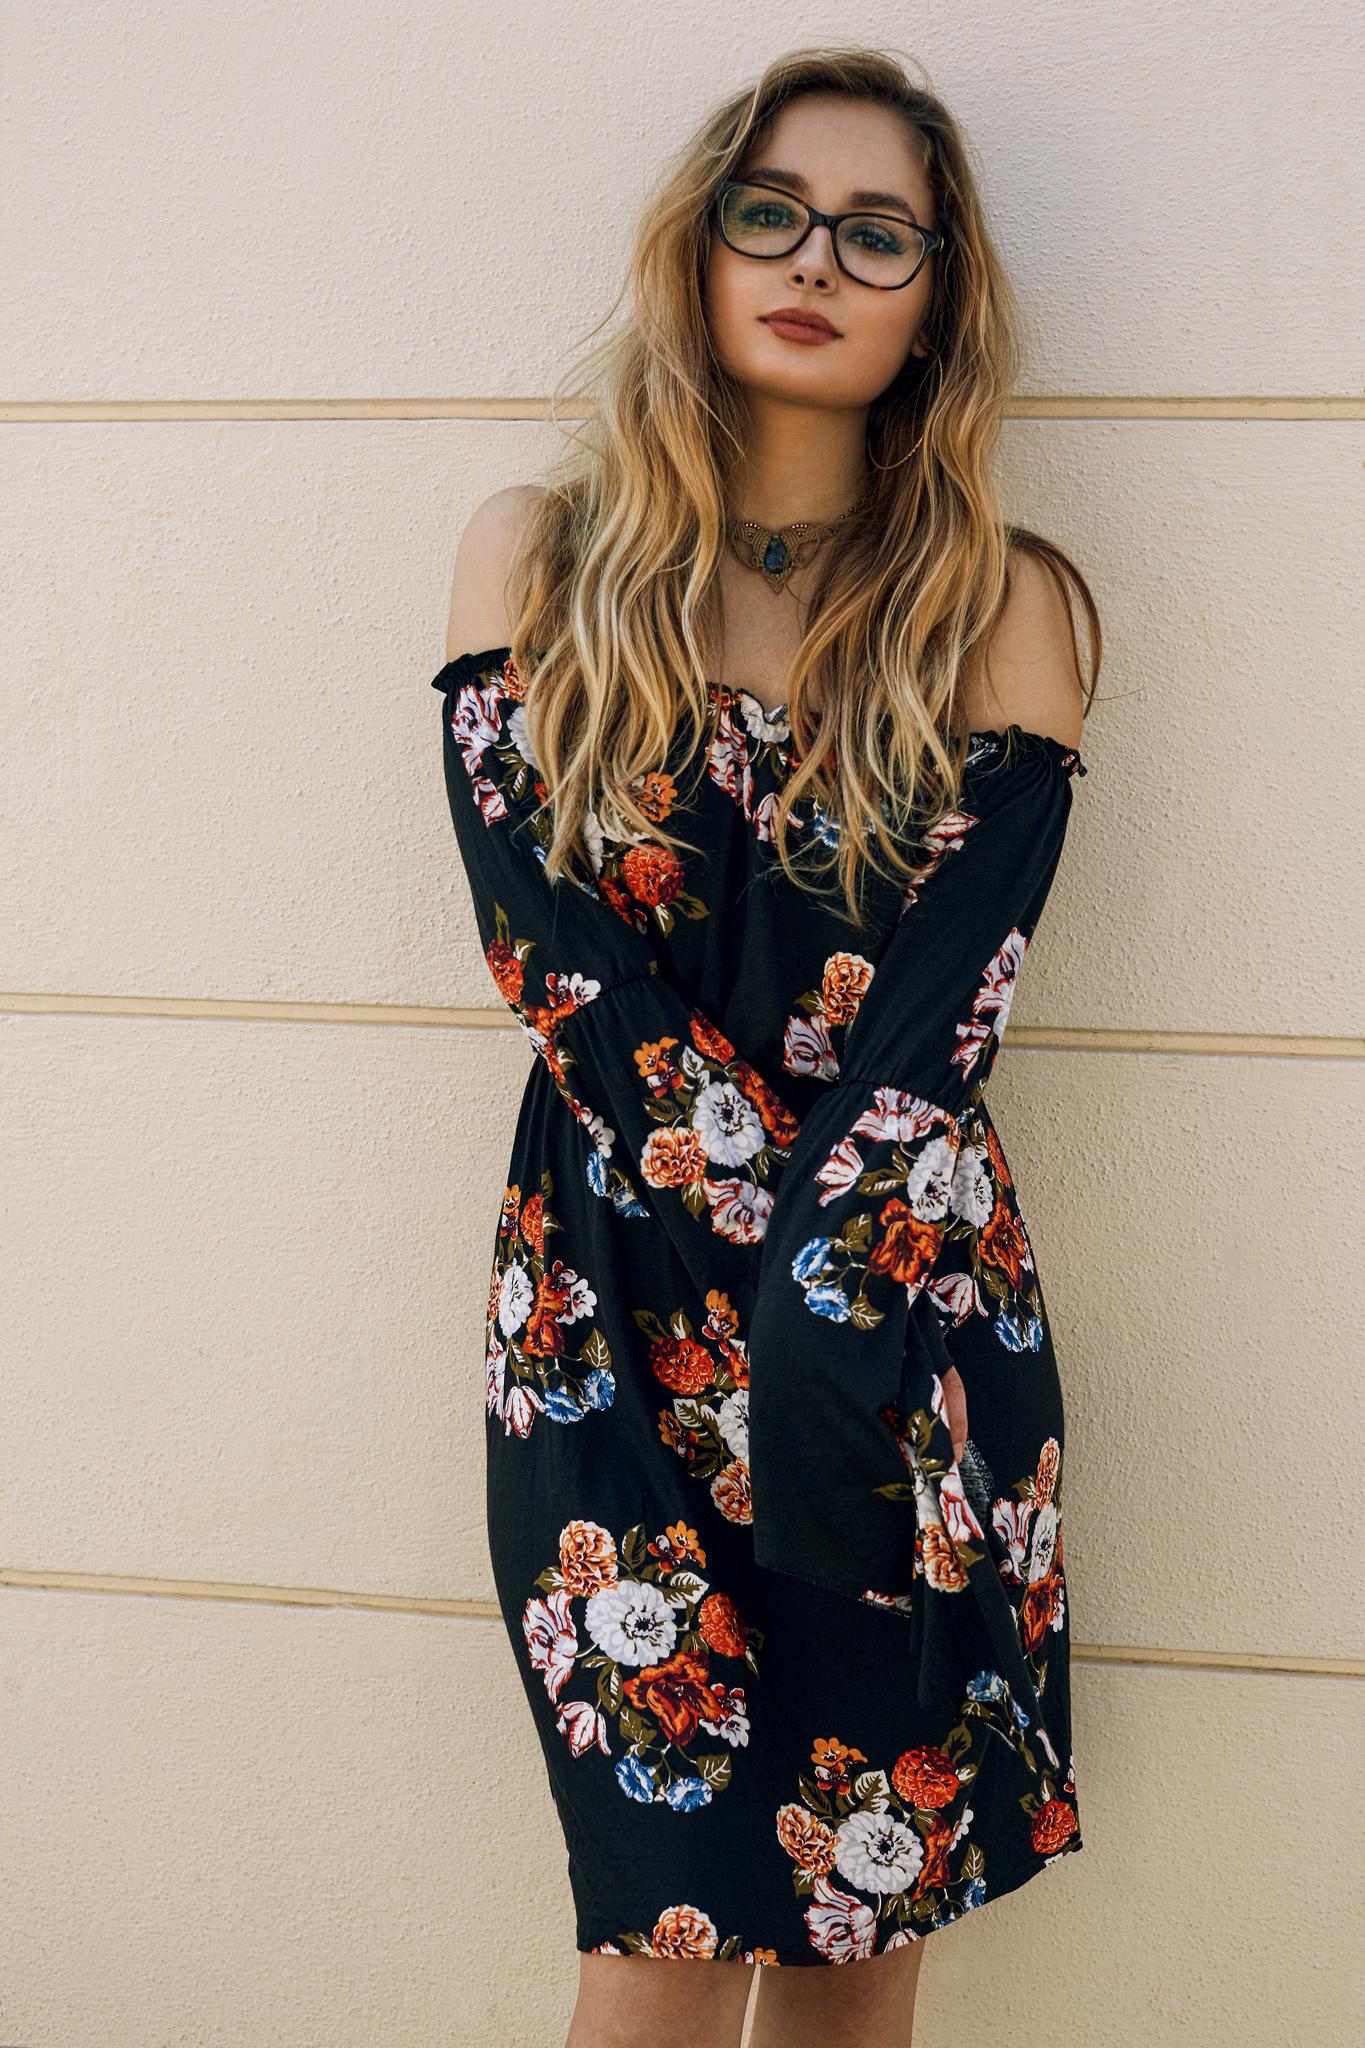 Emily_Fashion_1_Web.jpg